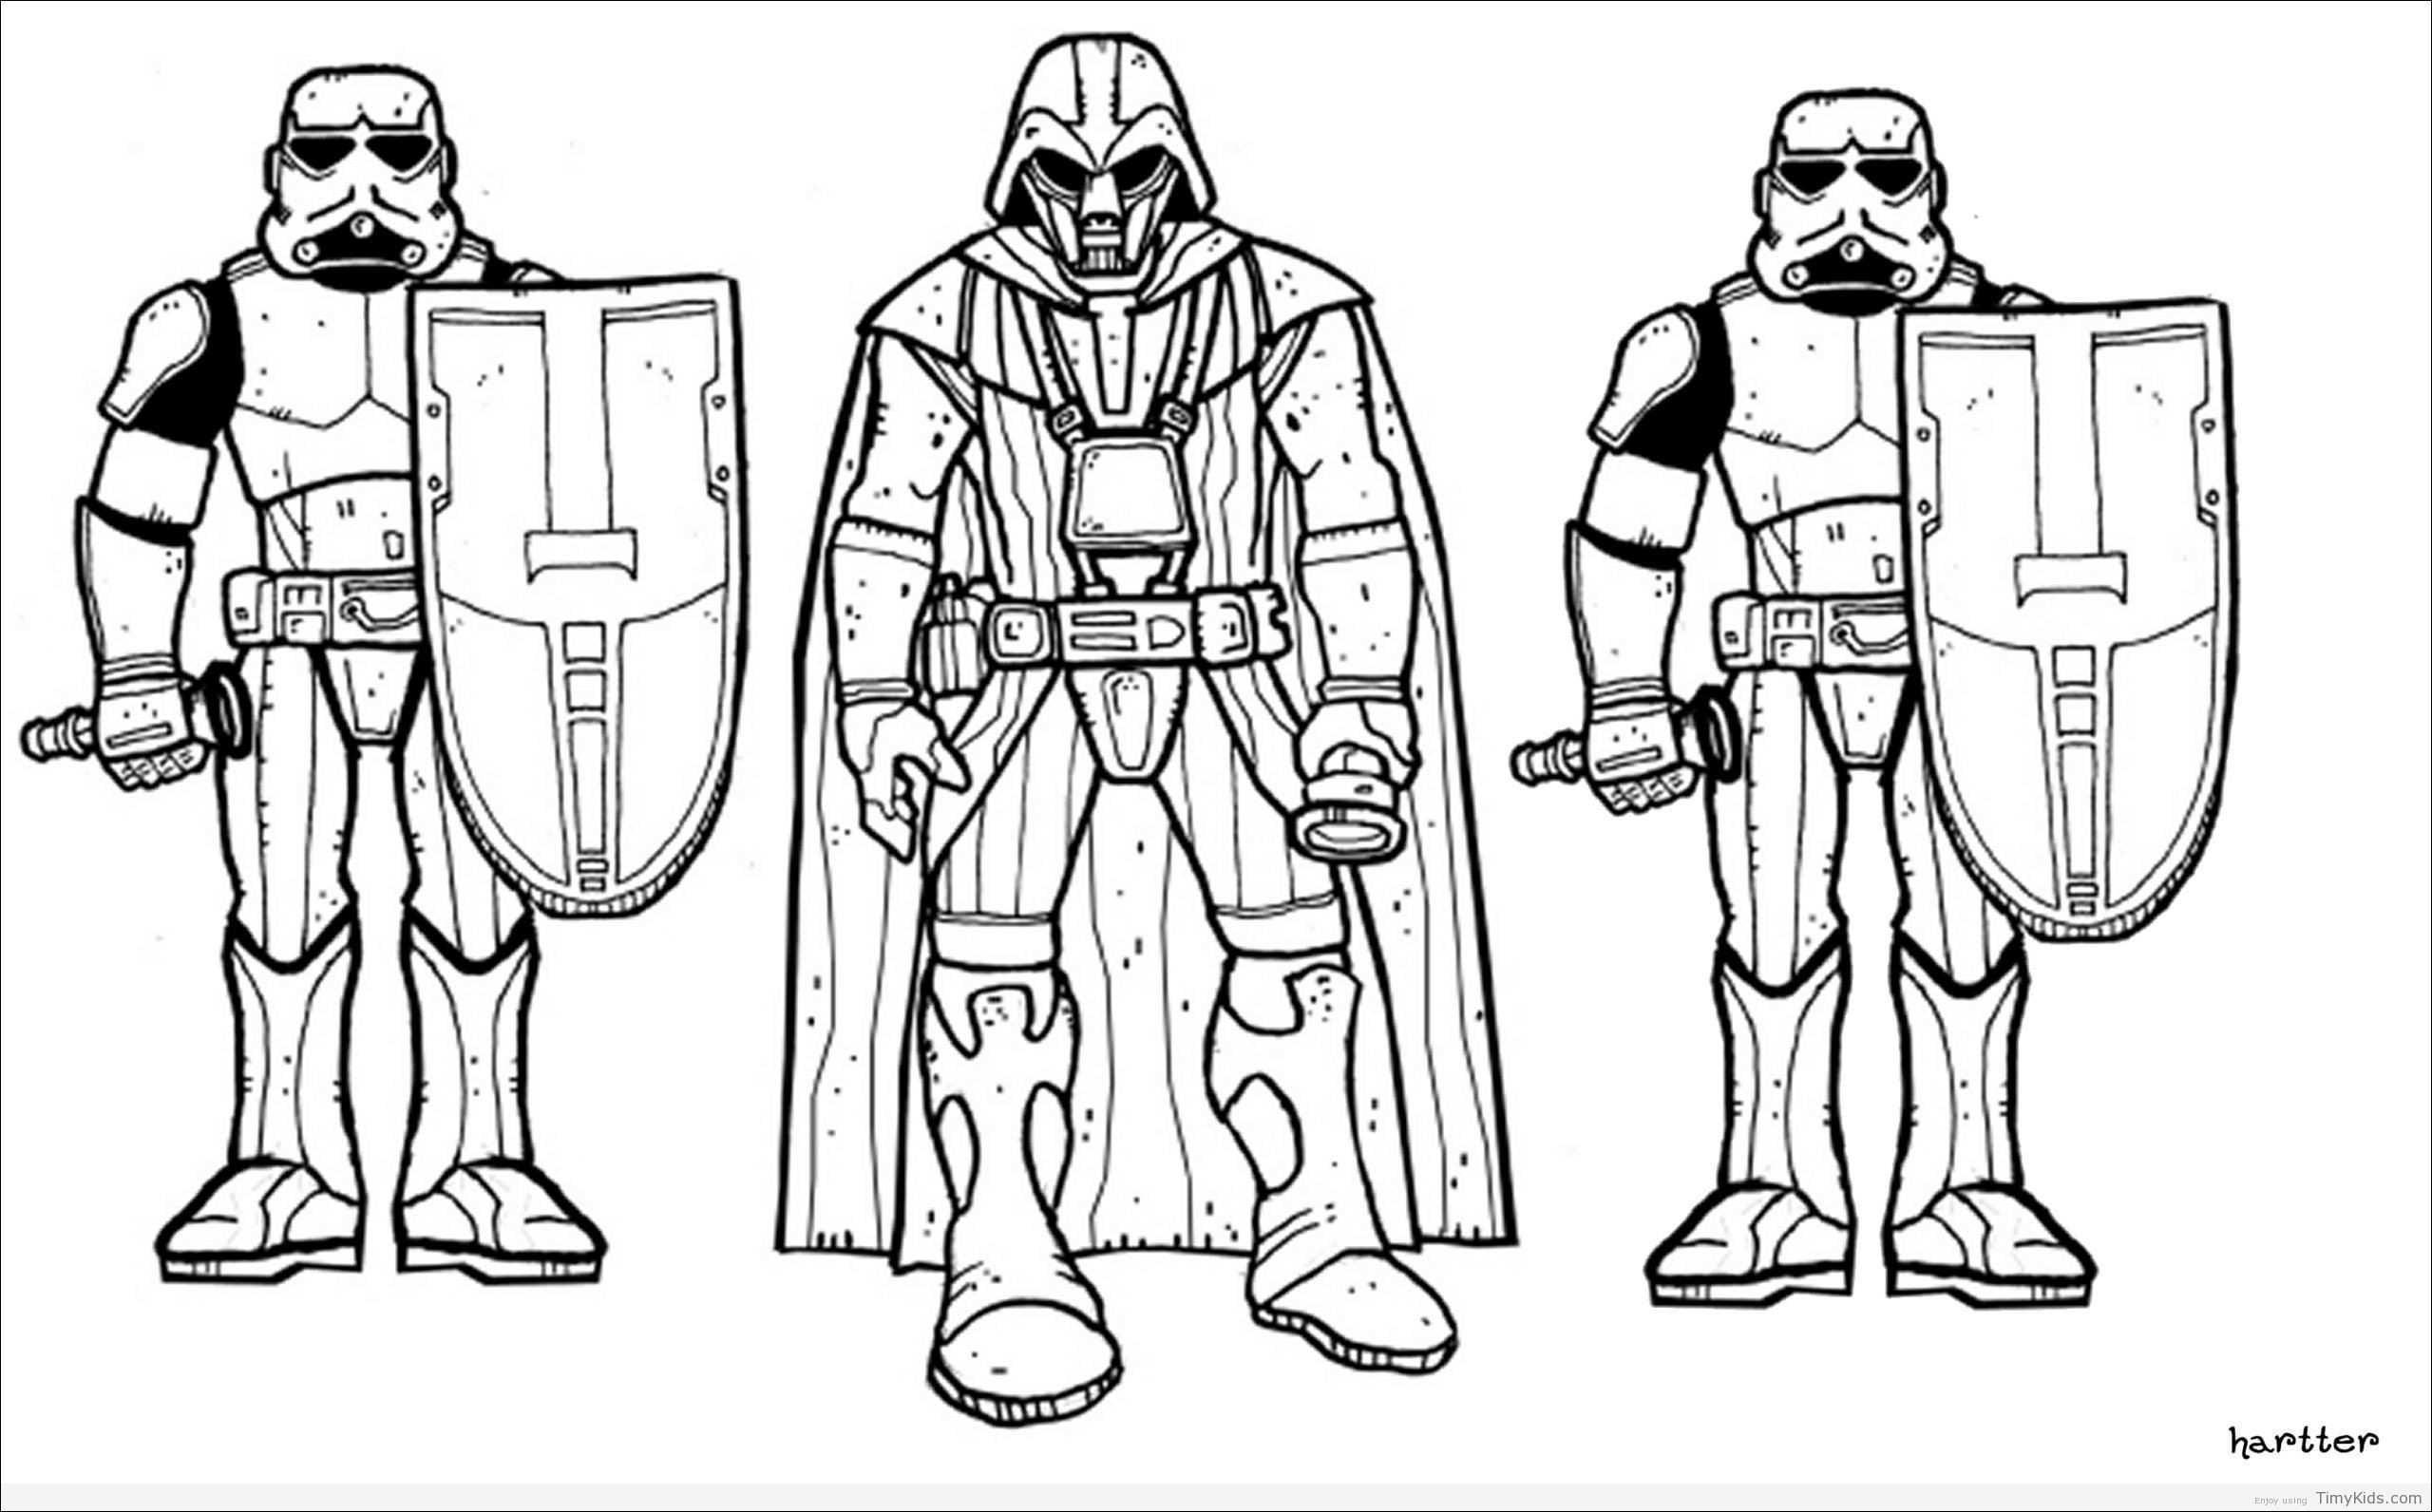 Boba Fett Ausmalbilder Einzigartig Anakin Skywalker Ausmalbilder Bildnis Ausmalbilder Star Wars the Stock